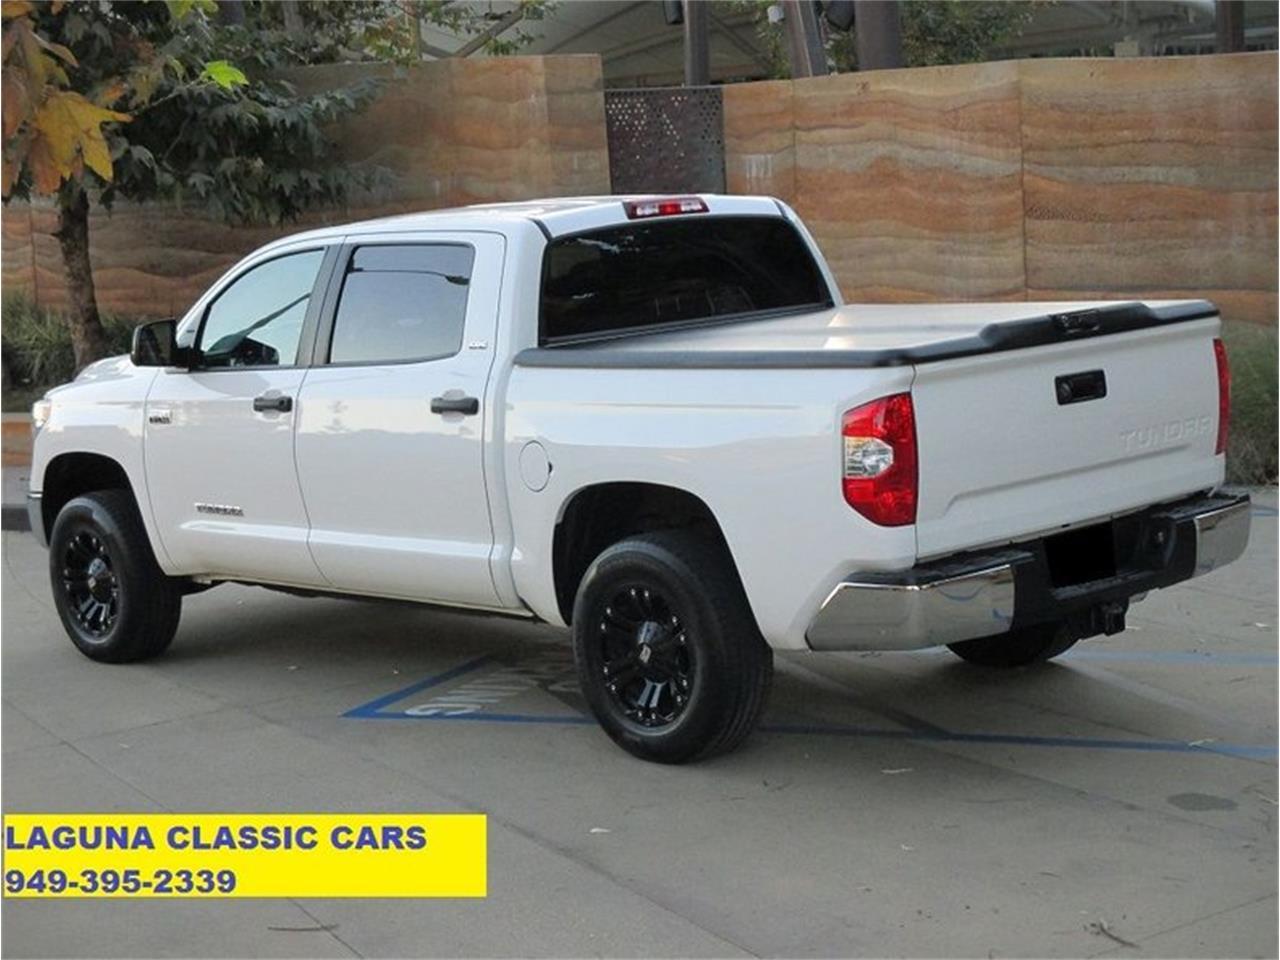 2015 Toyota Tundra (CC-1294387) for sale in Laguna Beach, California